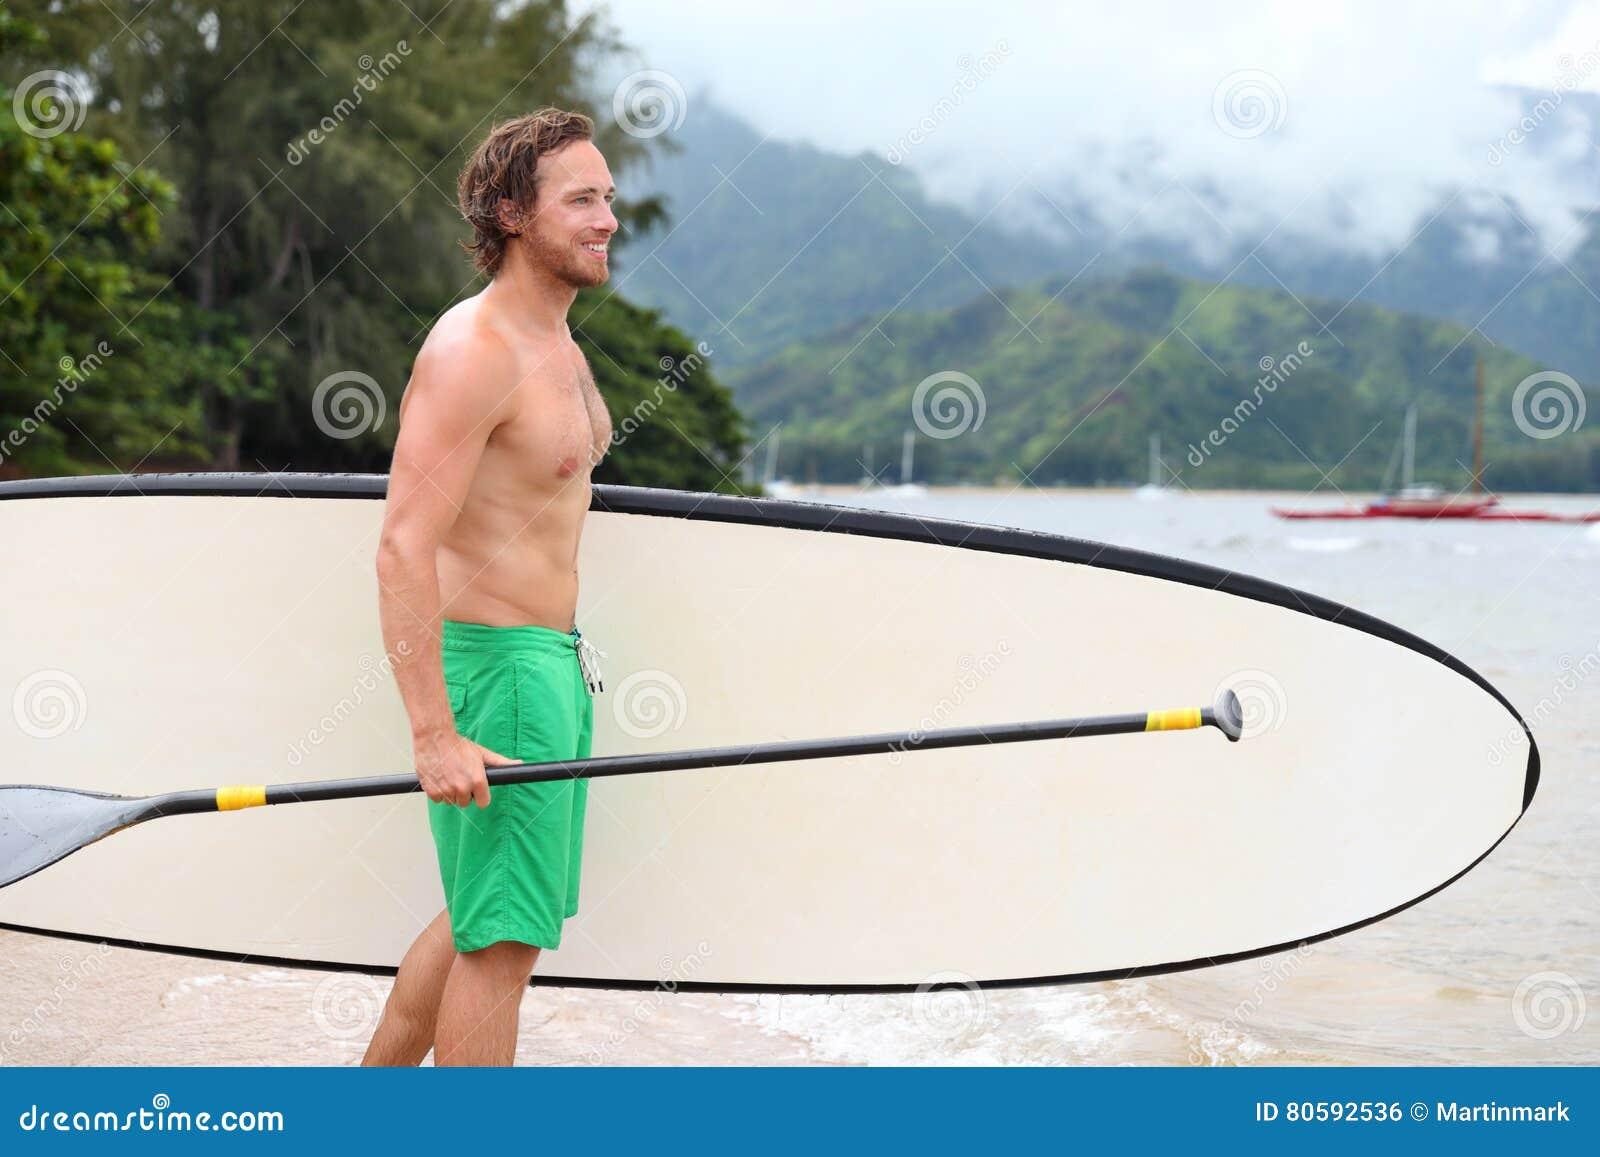 Stoi up paddle deski plaży mężczyzna robi paddleboard